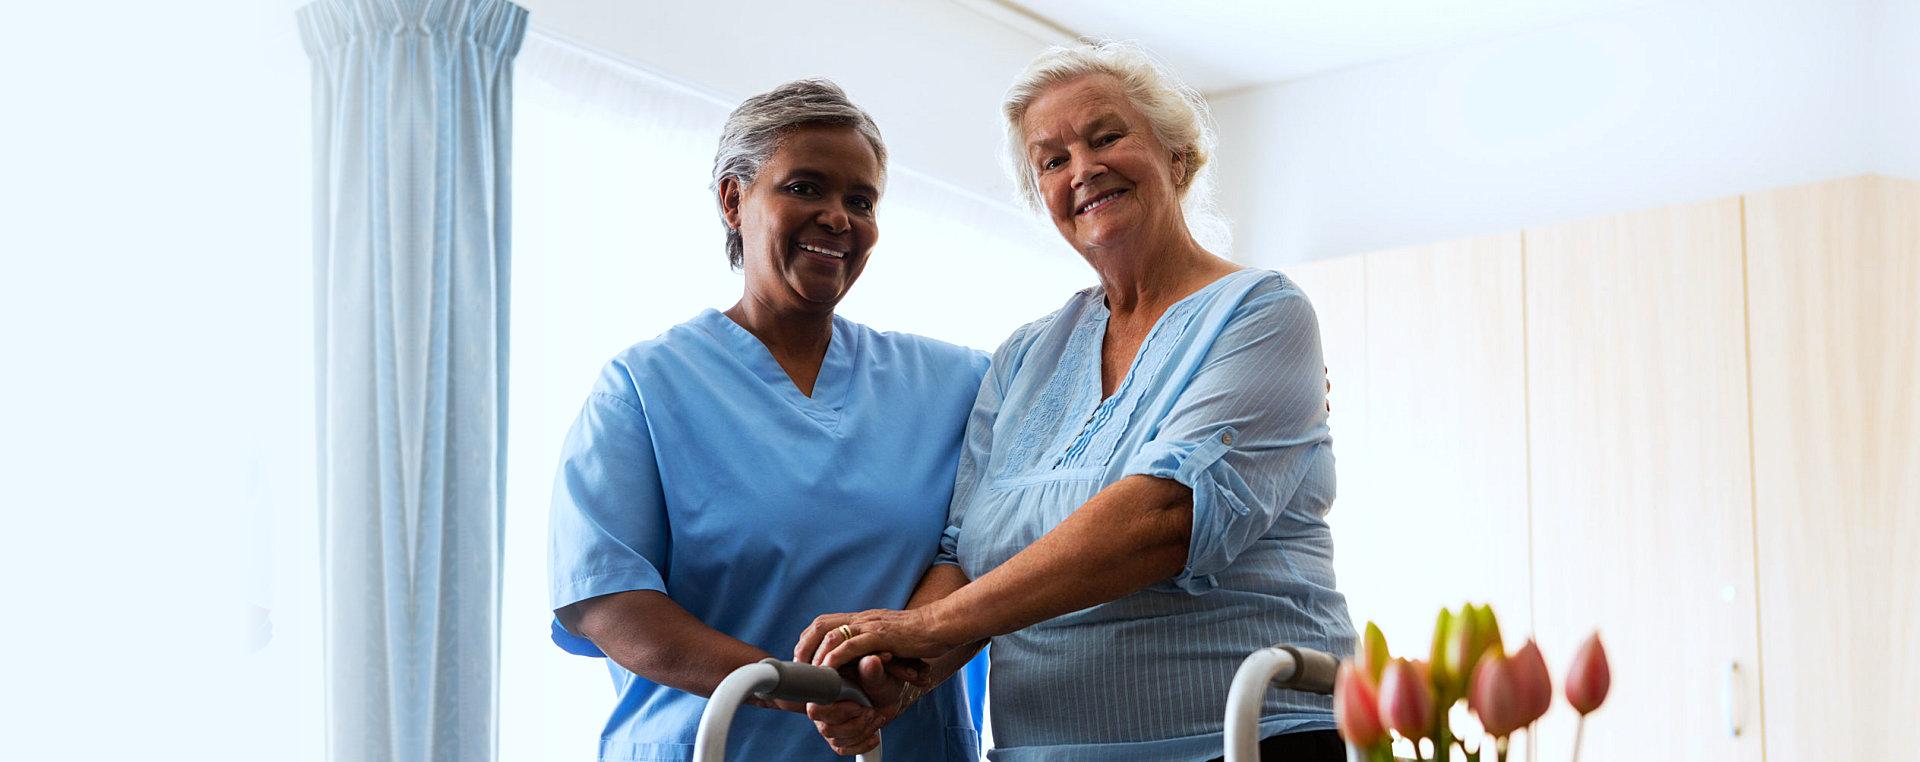 elder woman and her caregiver smiling